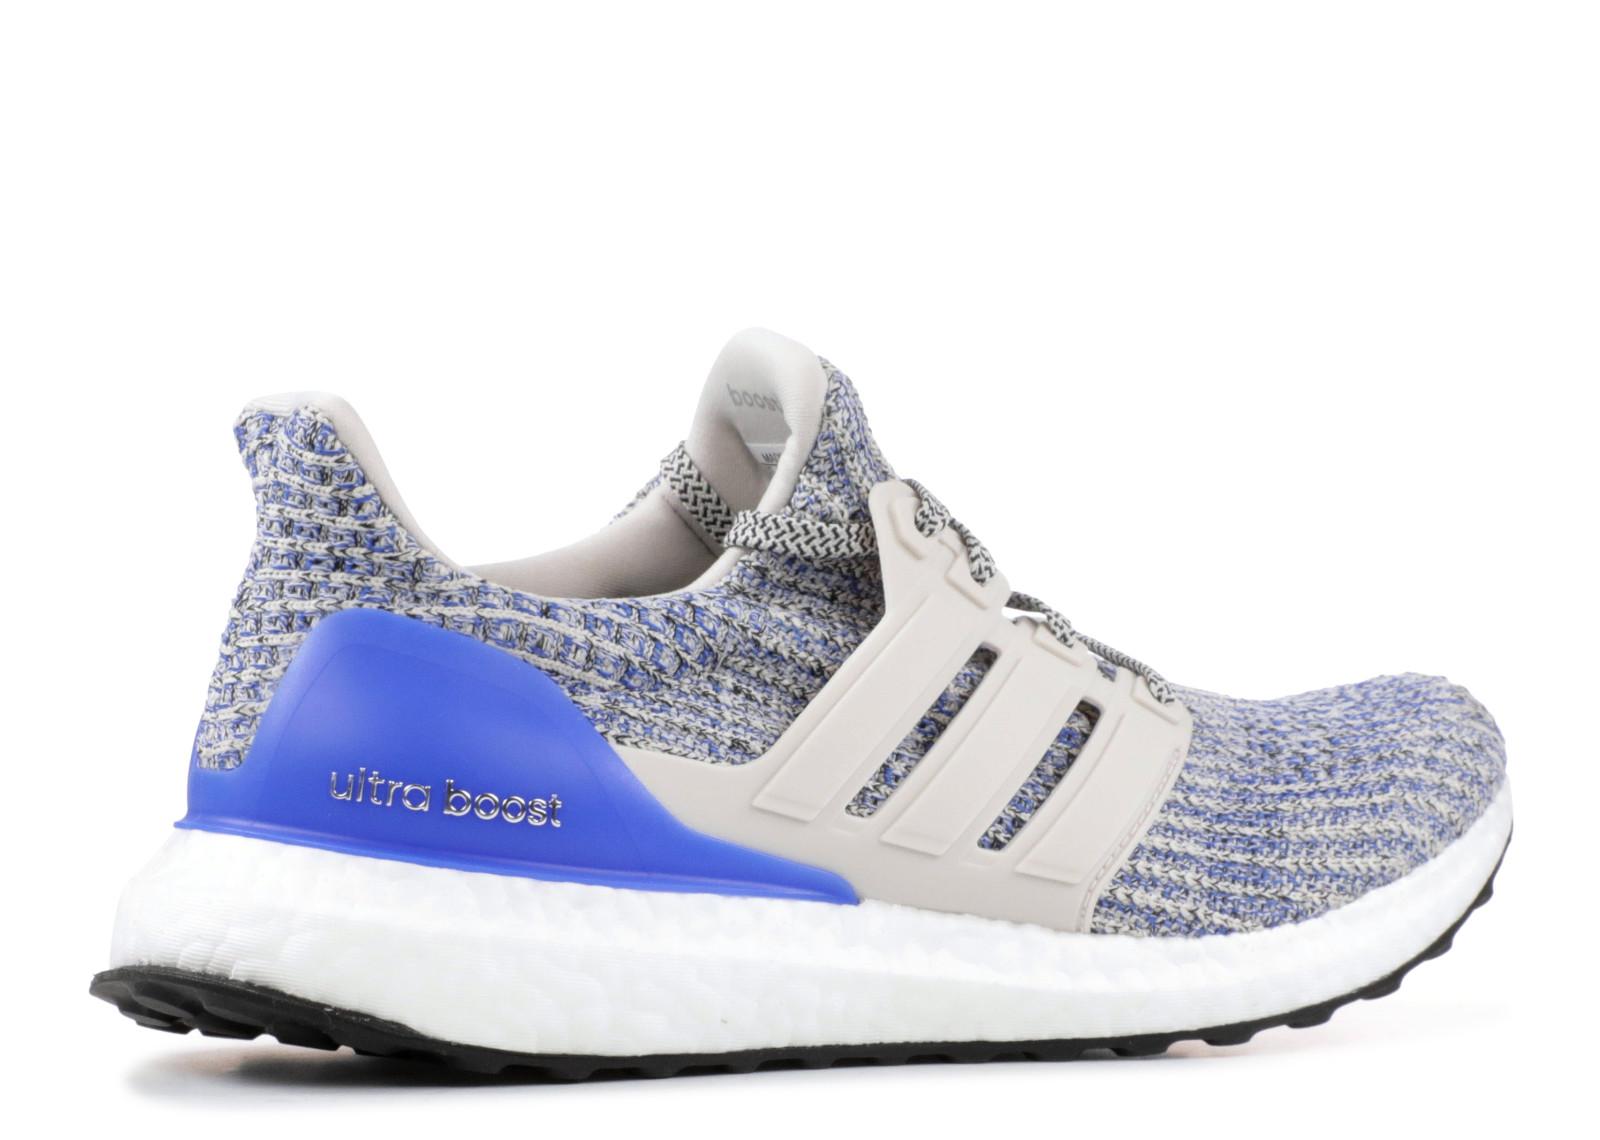 e22660a50 adidas Ultra Boost 4.0 Royal Blue - 3